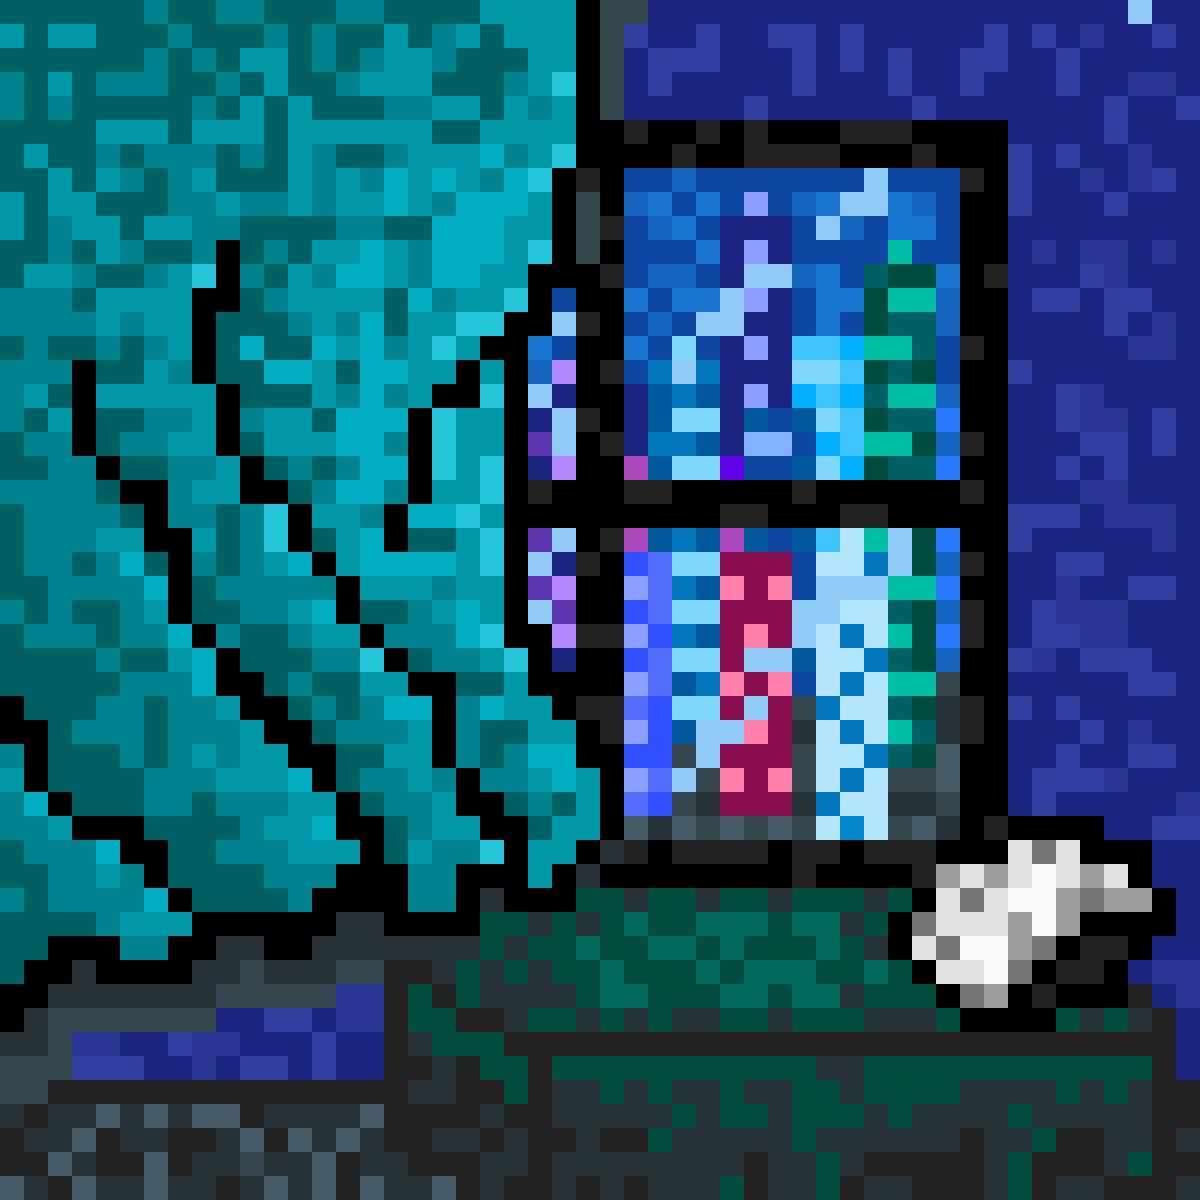 Calm night by Sirdreadnaught